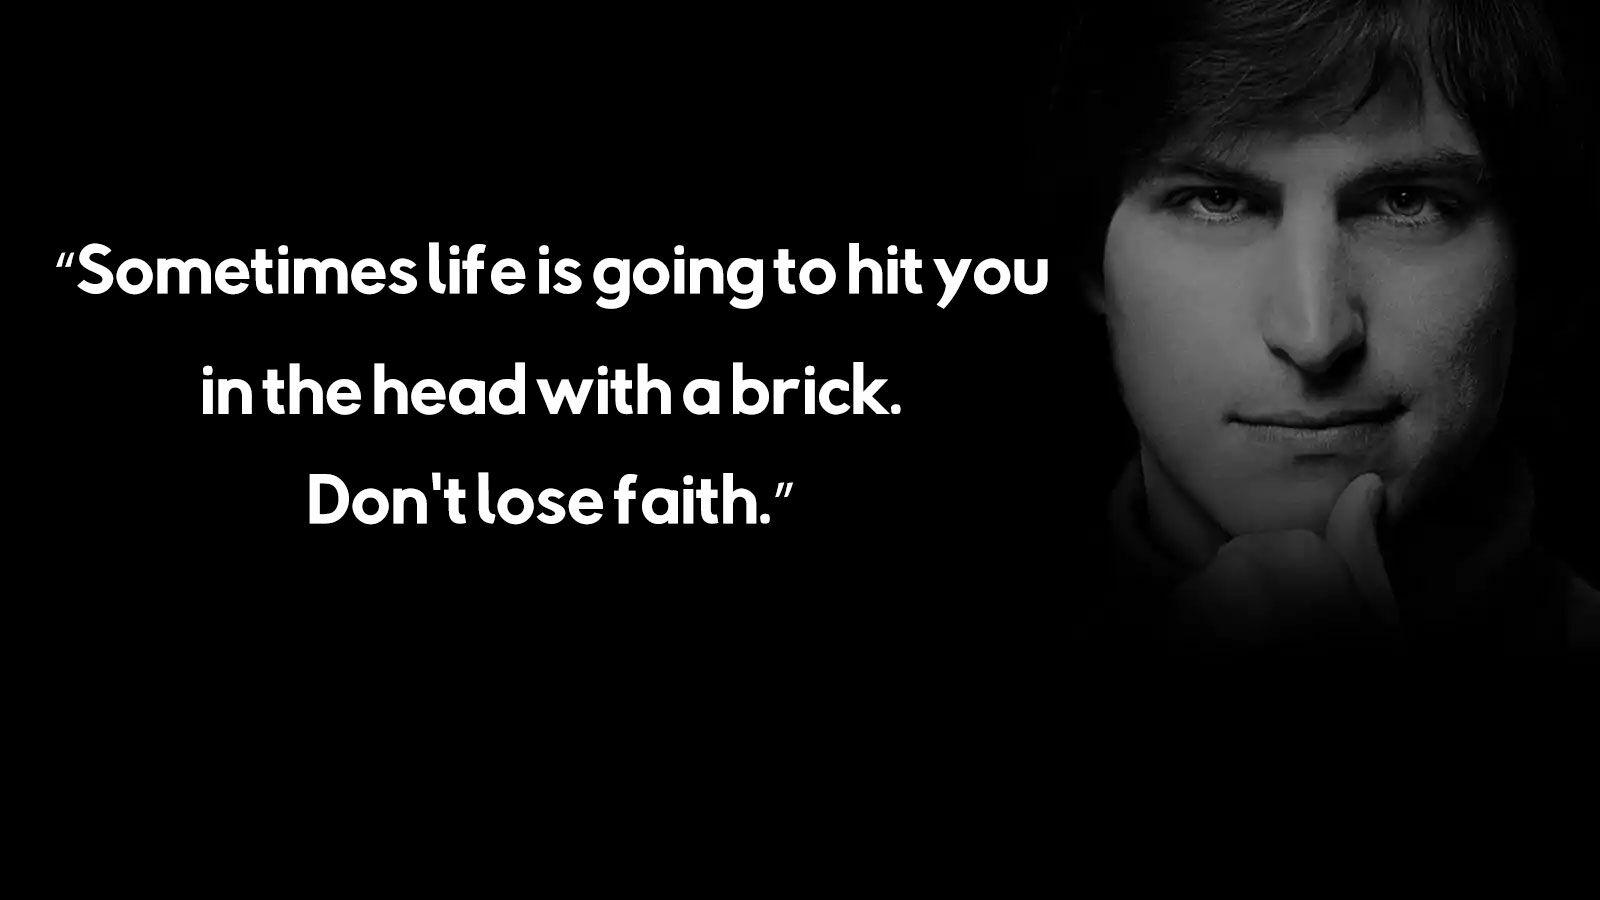 Kadang Kadang Hidup Akan Memukul Kamu Di Kepala Dengan Batu Bata Jangan Kehilangan Iman